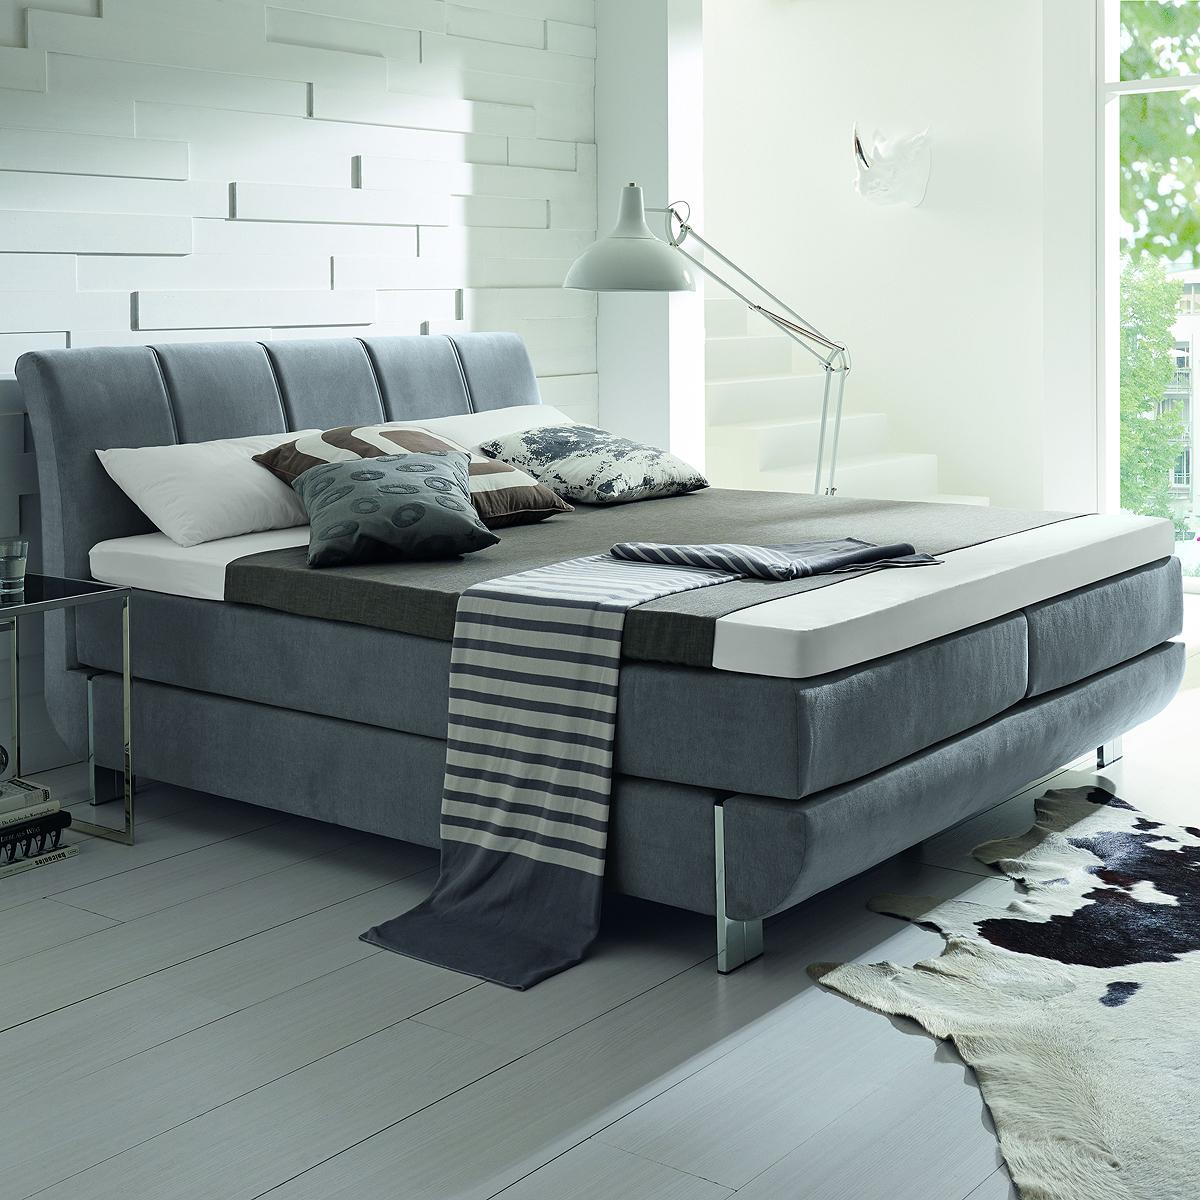 boxspringbett ronda bett in hellgrau mit bonnellfederkern. Black Bedroom Furniture Sets. Home Design Ideas